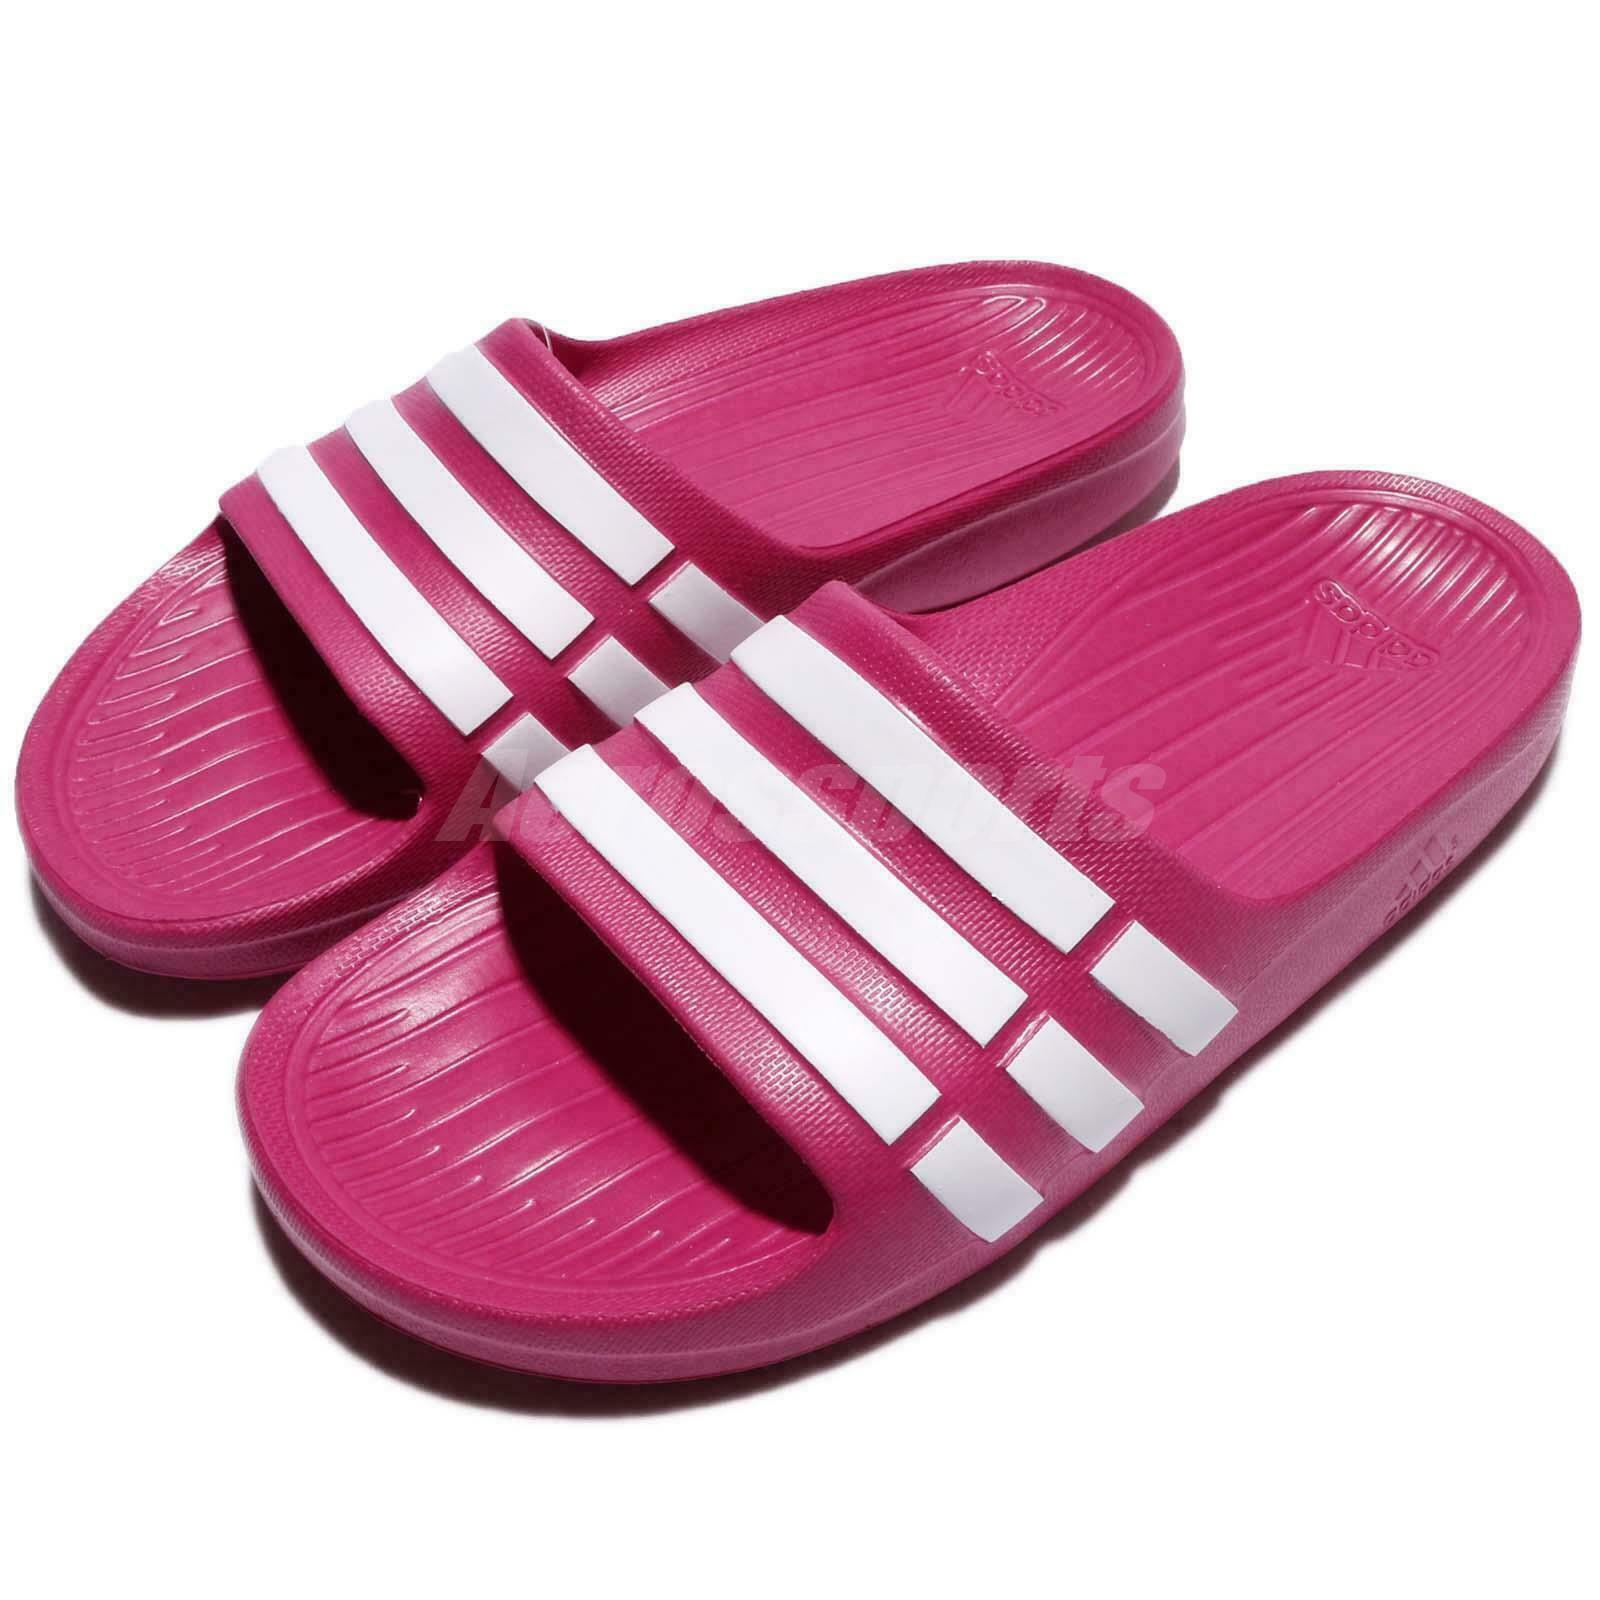 adidas Duramo Slide K Pink White Kids Youth Girls Sports Sandal G06797 S-6